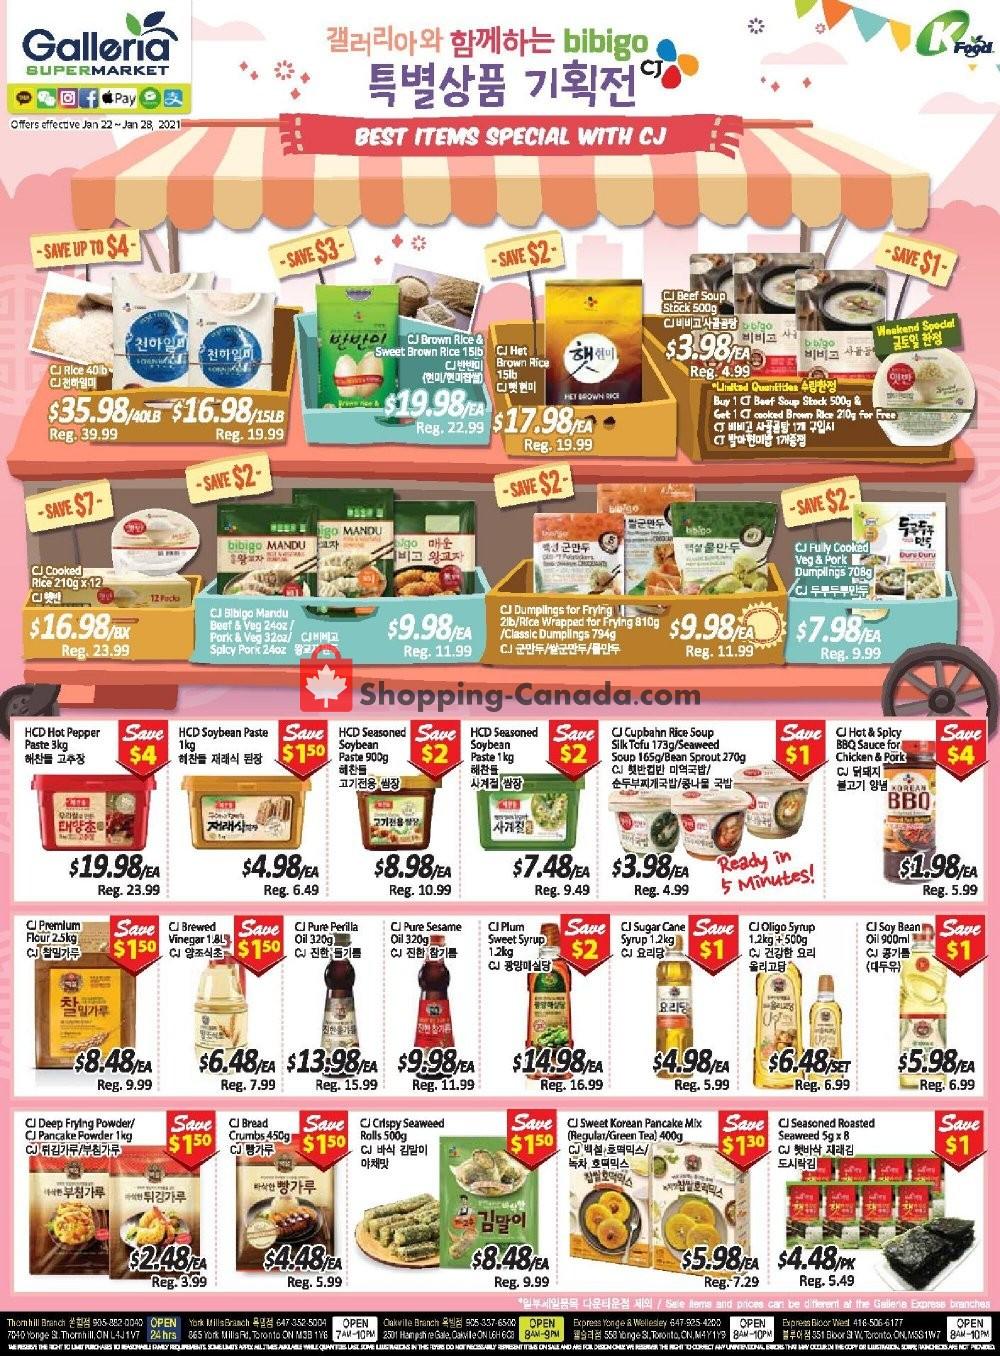 Flyer Galleria Supermarket Canada - from Friday January 22, 2021 to Thursday January 28, 2021